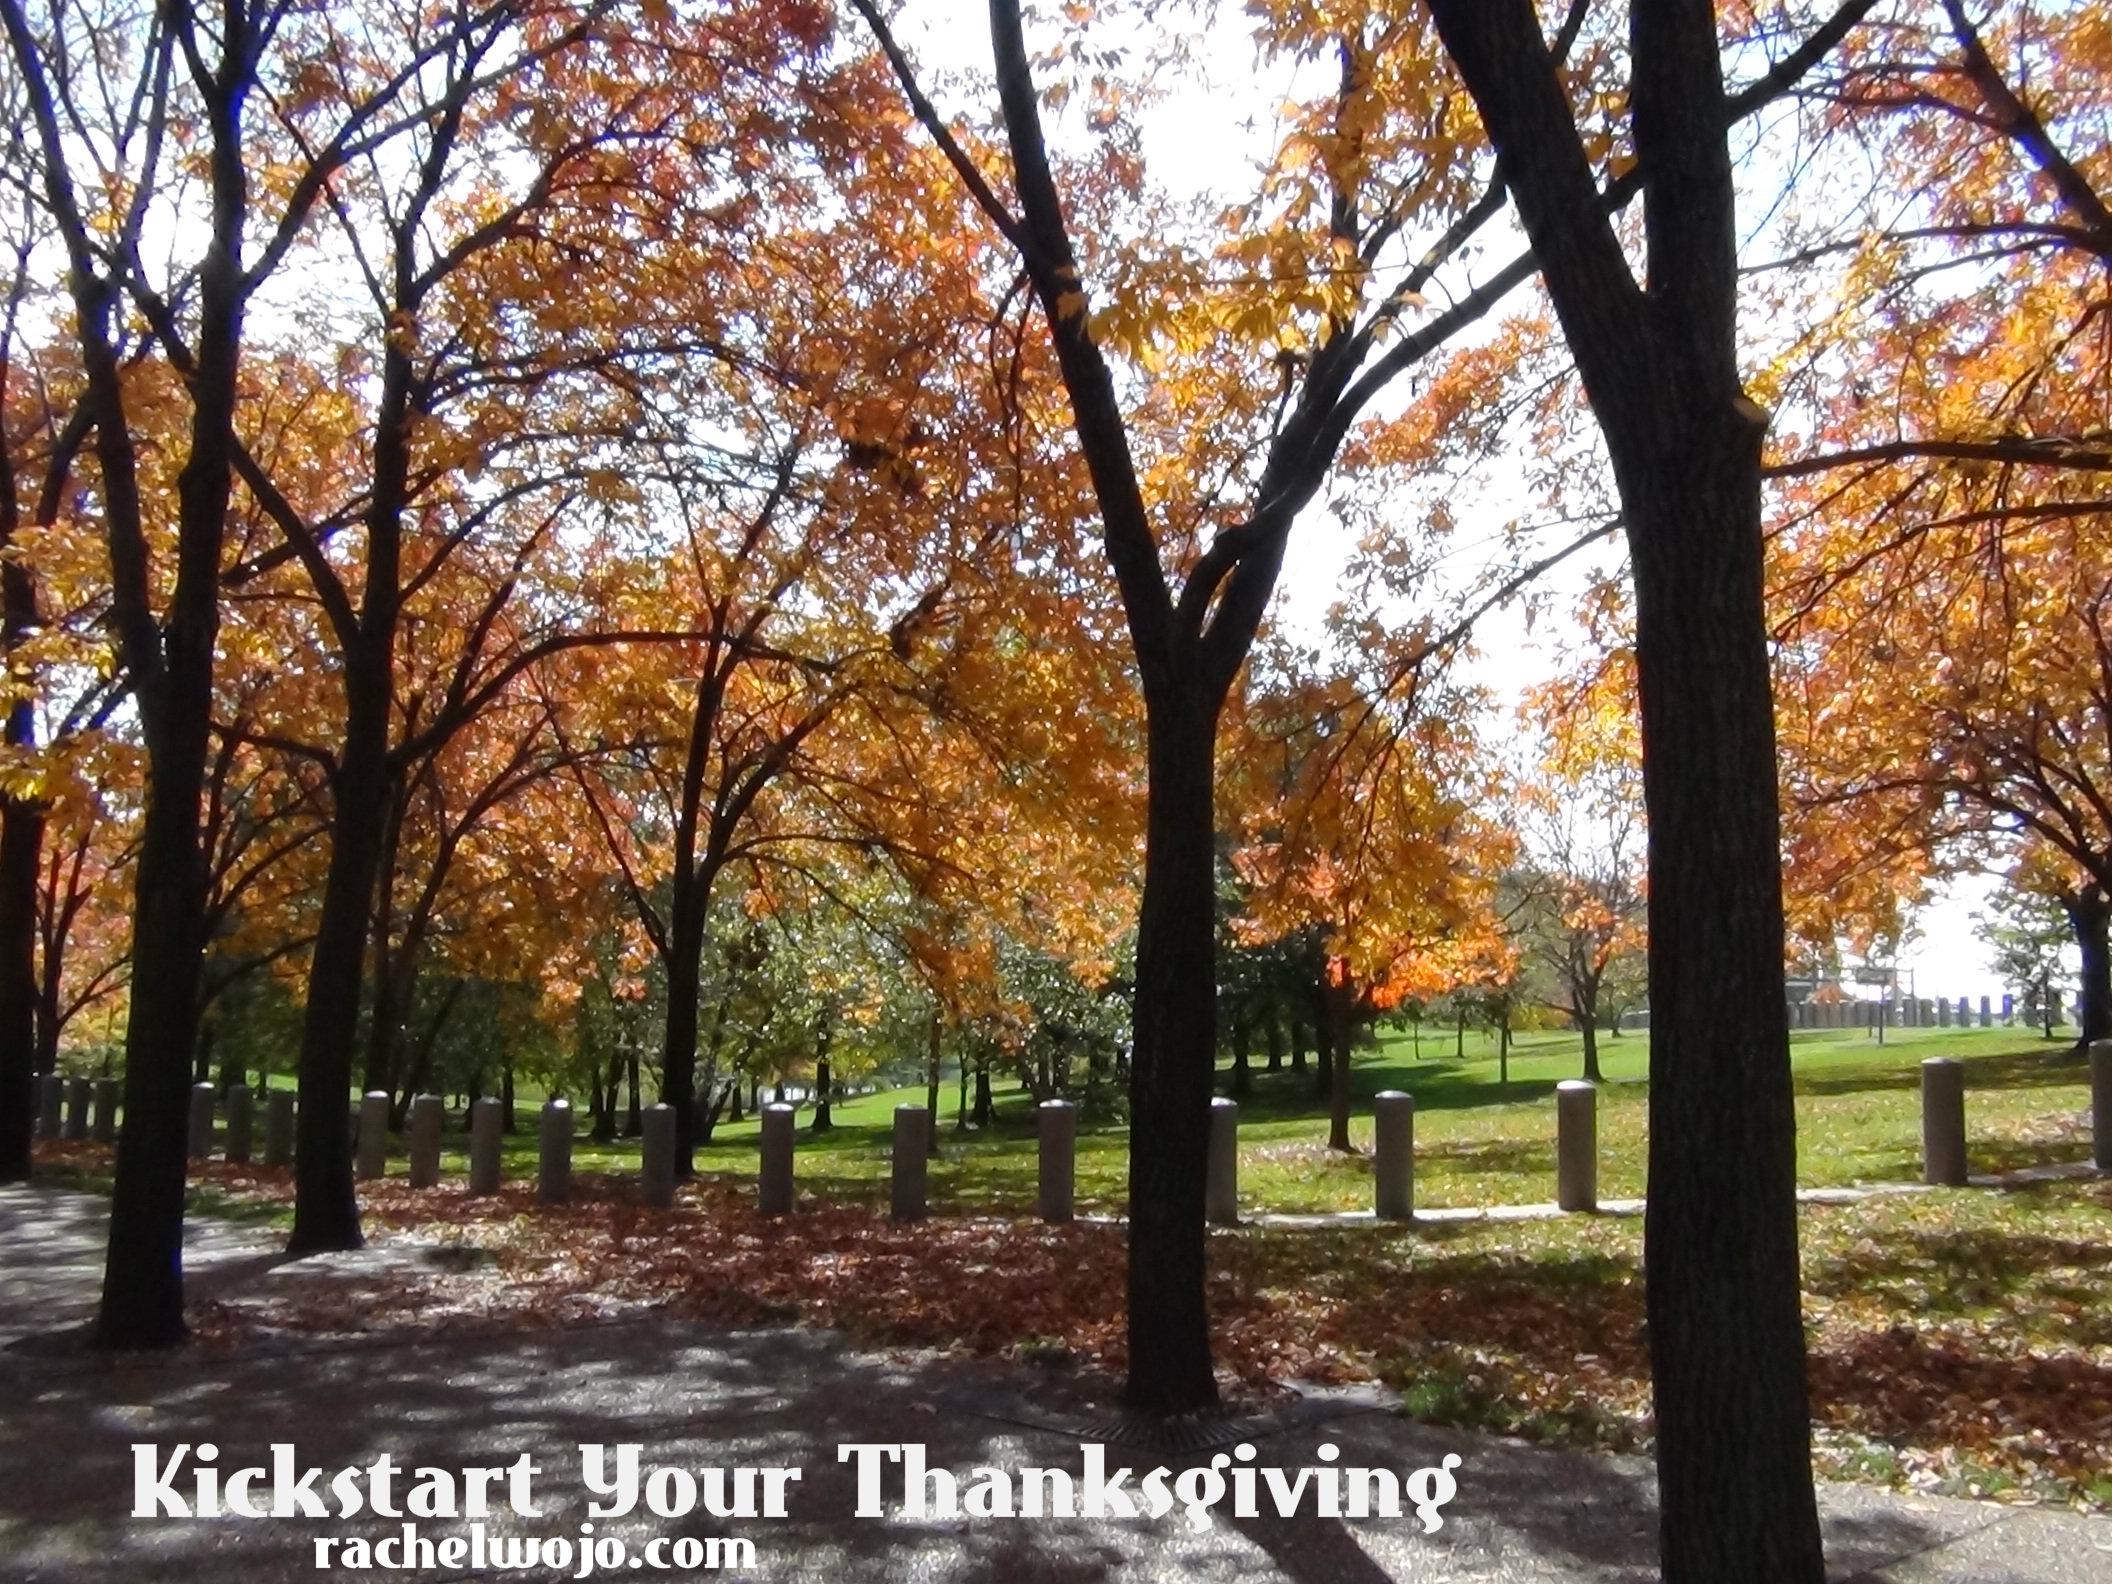 Bible verse list for Thanksgiving